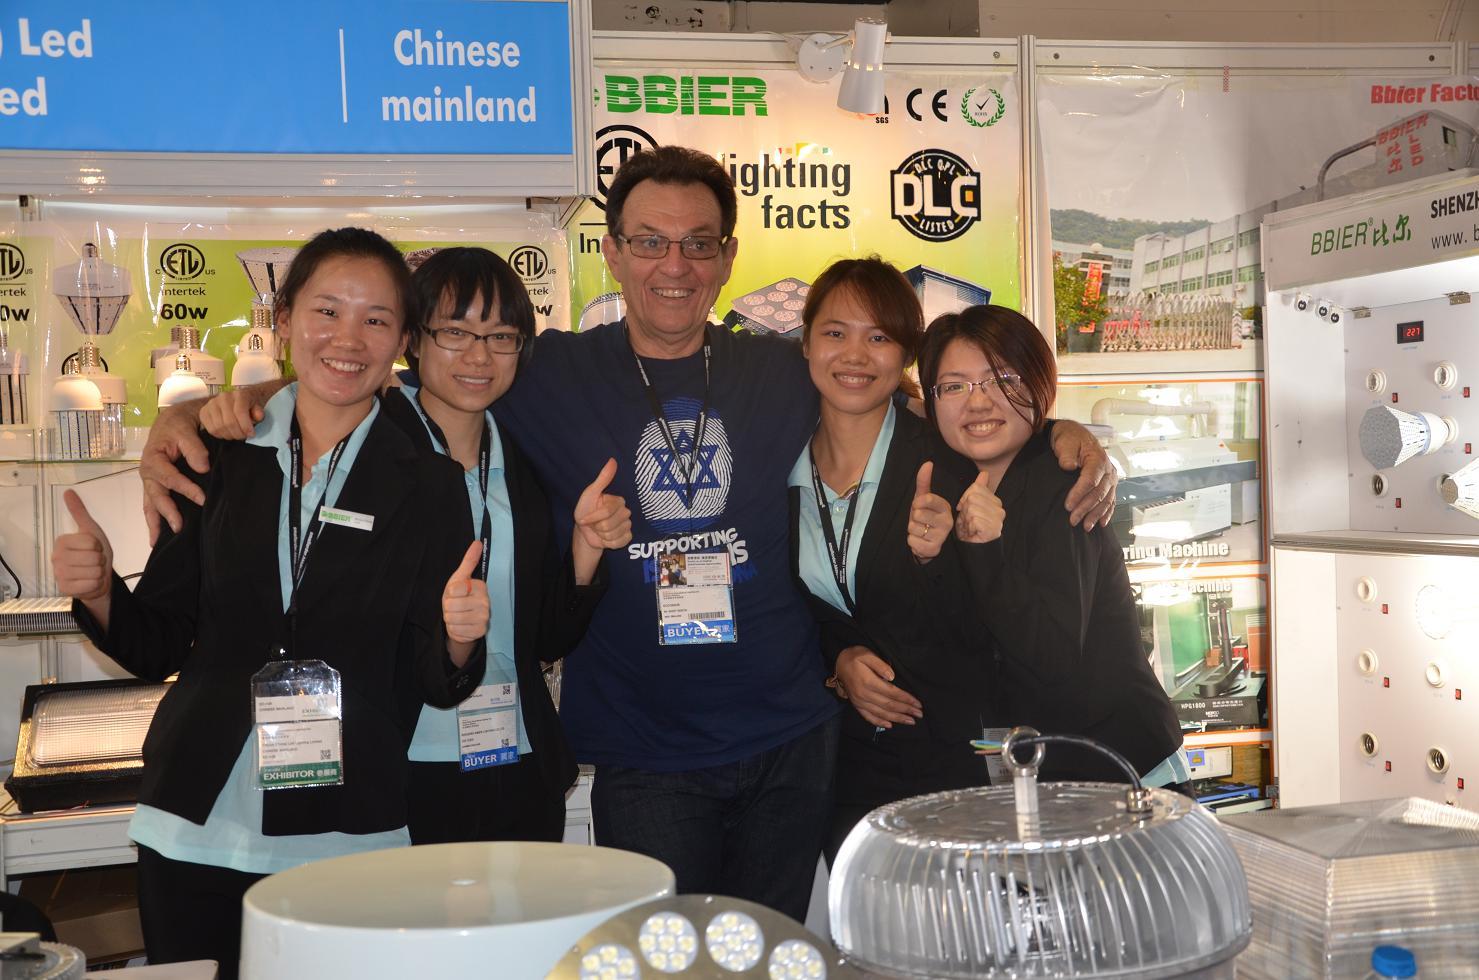 Bbier HongKong Fair October 1